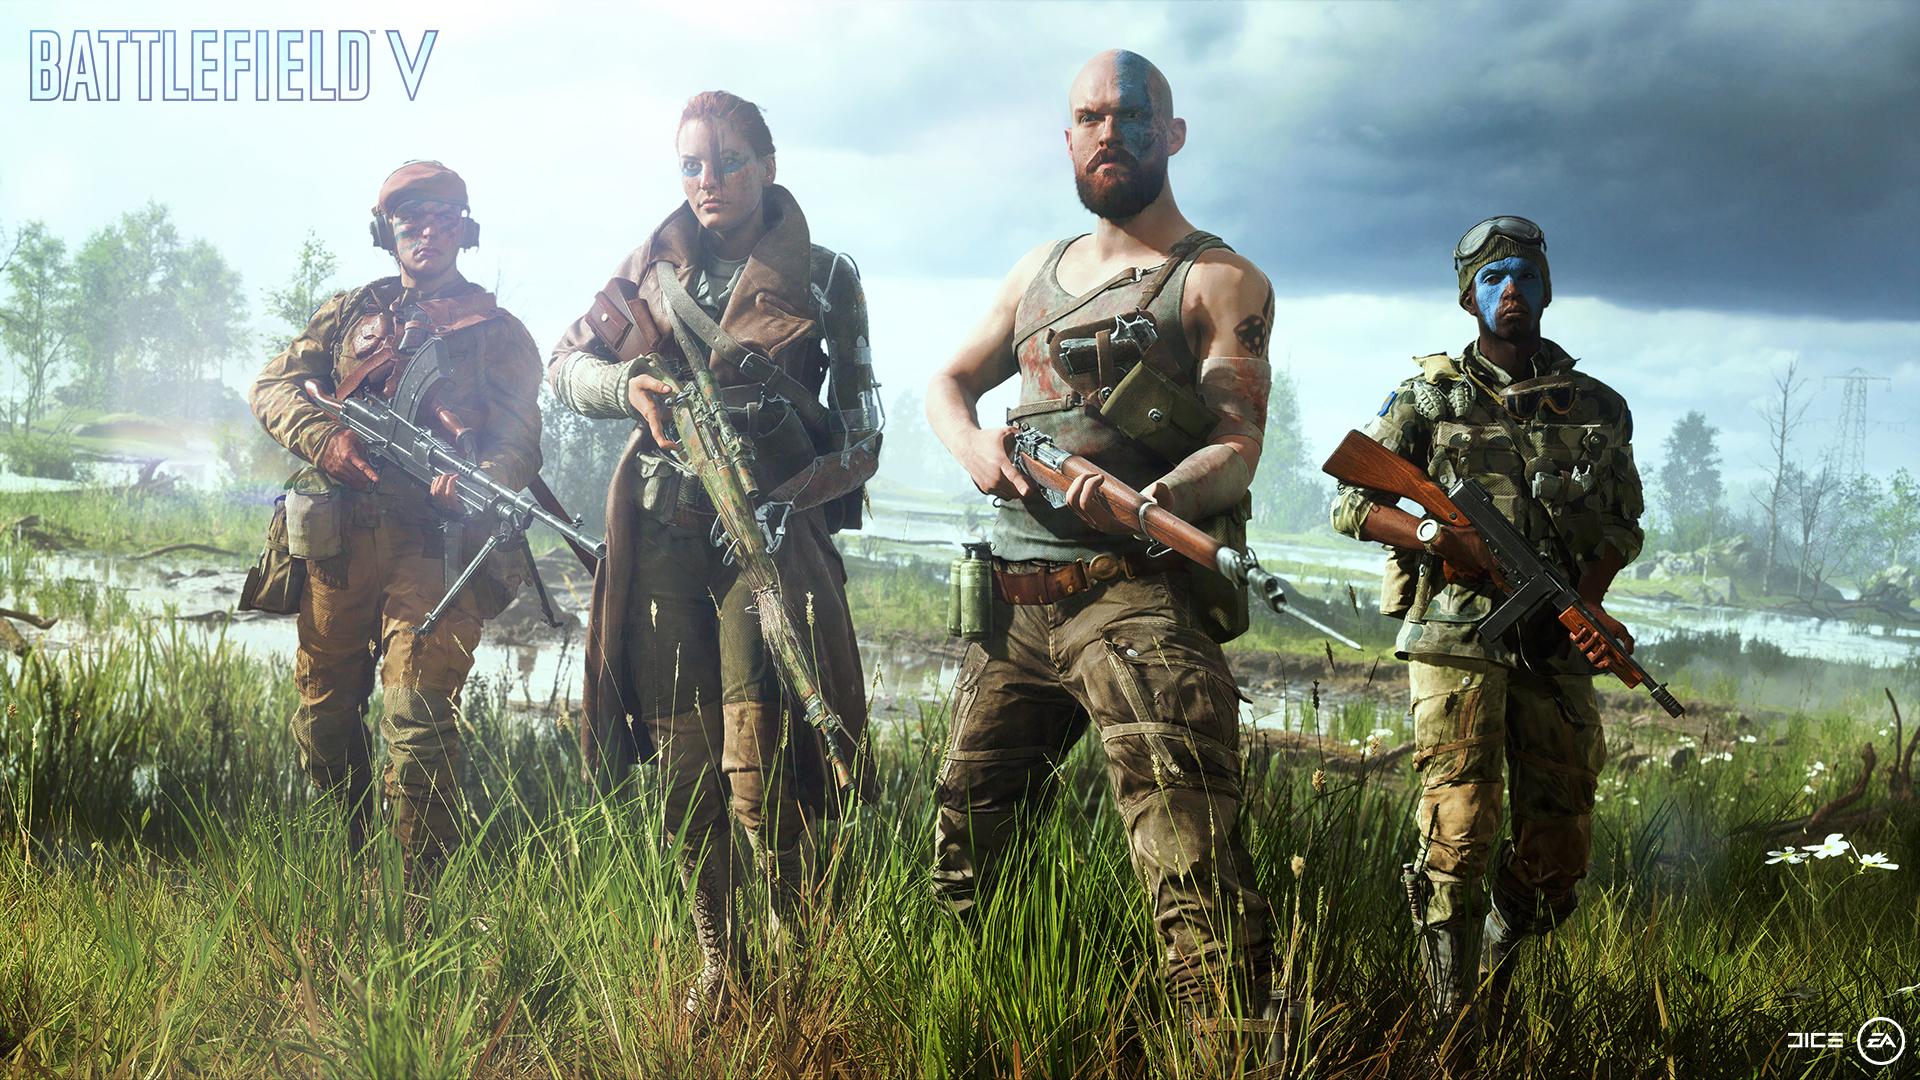 Battlefield v player customization